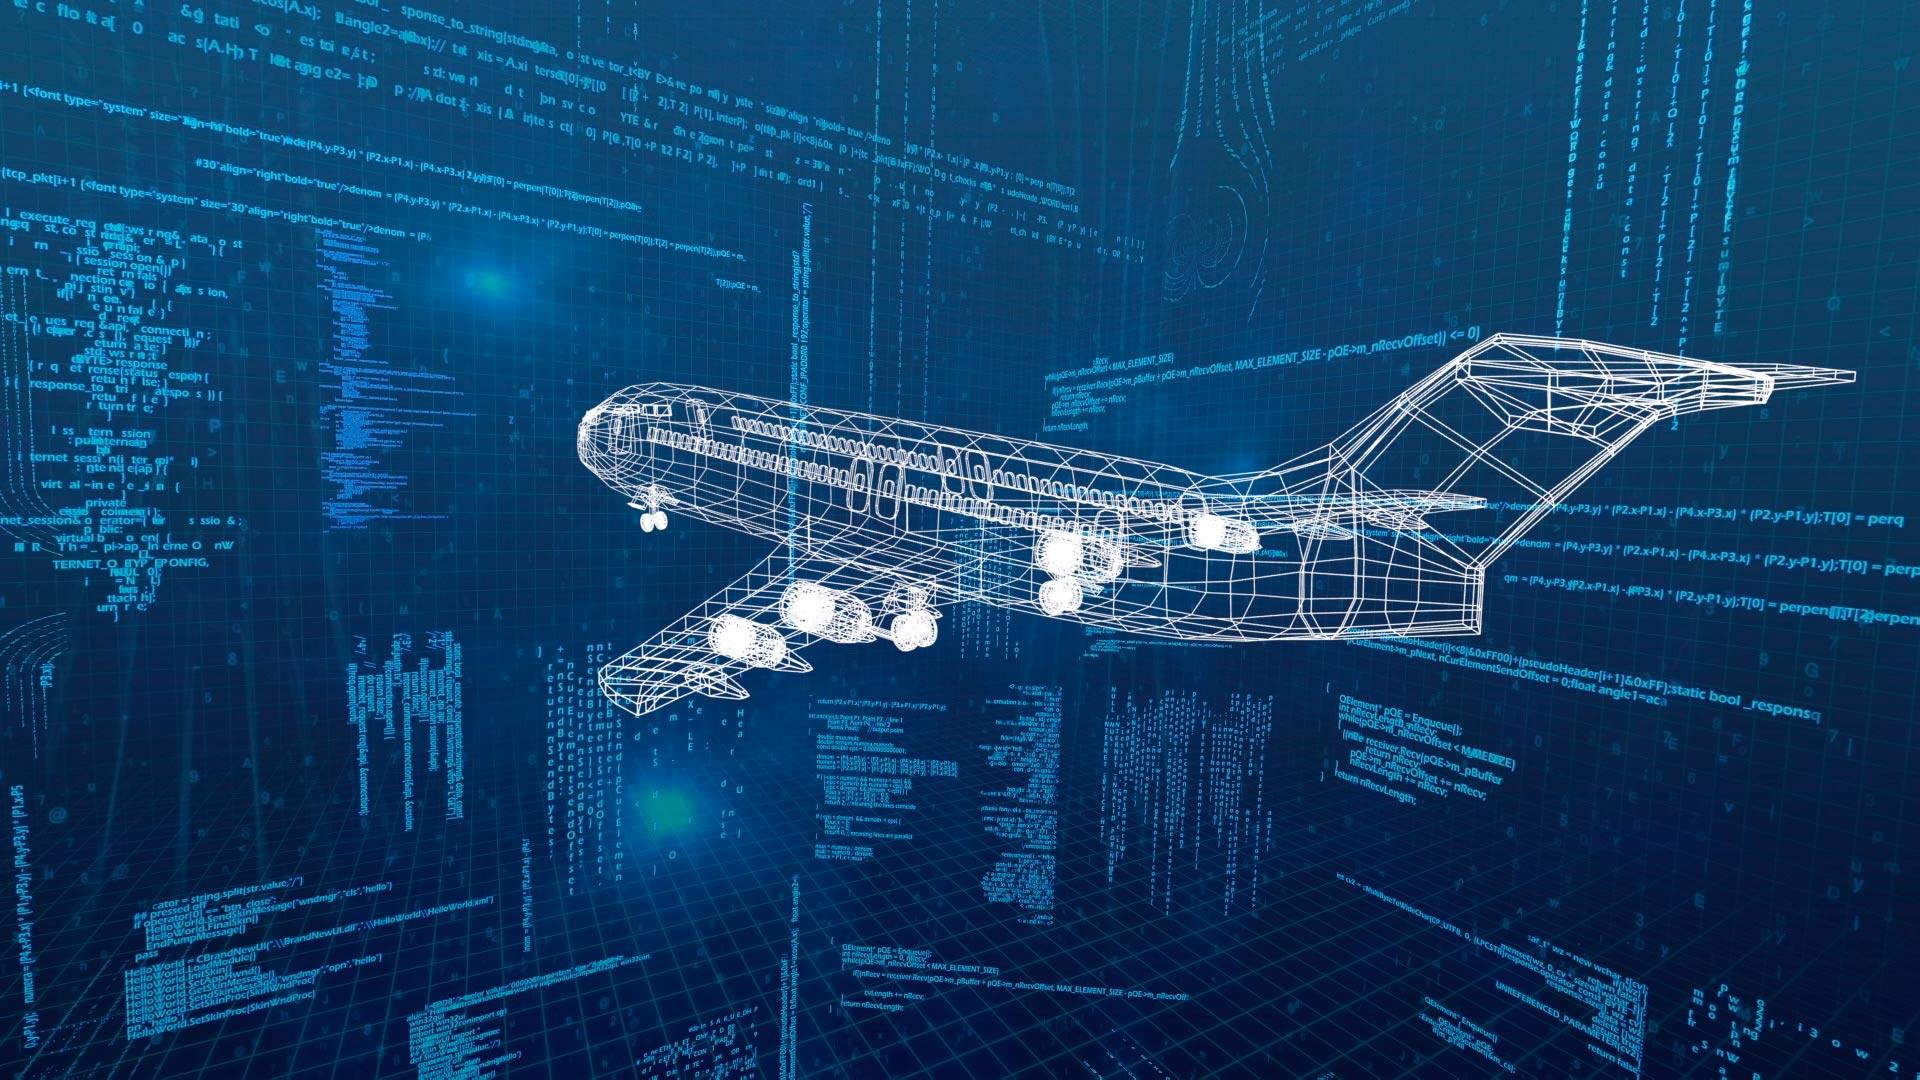 MODELADO 3D - Empresa de servicio especializado en diseño 3D